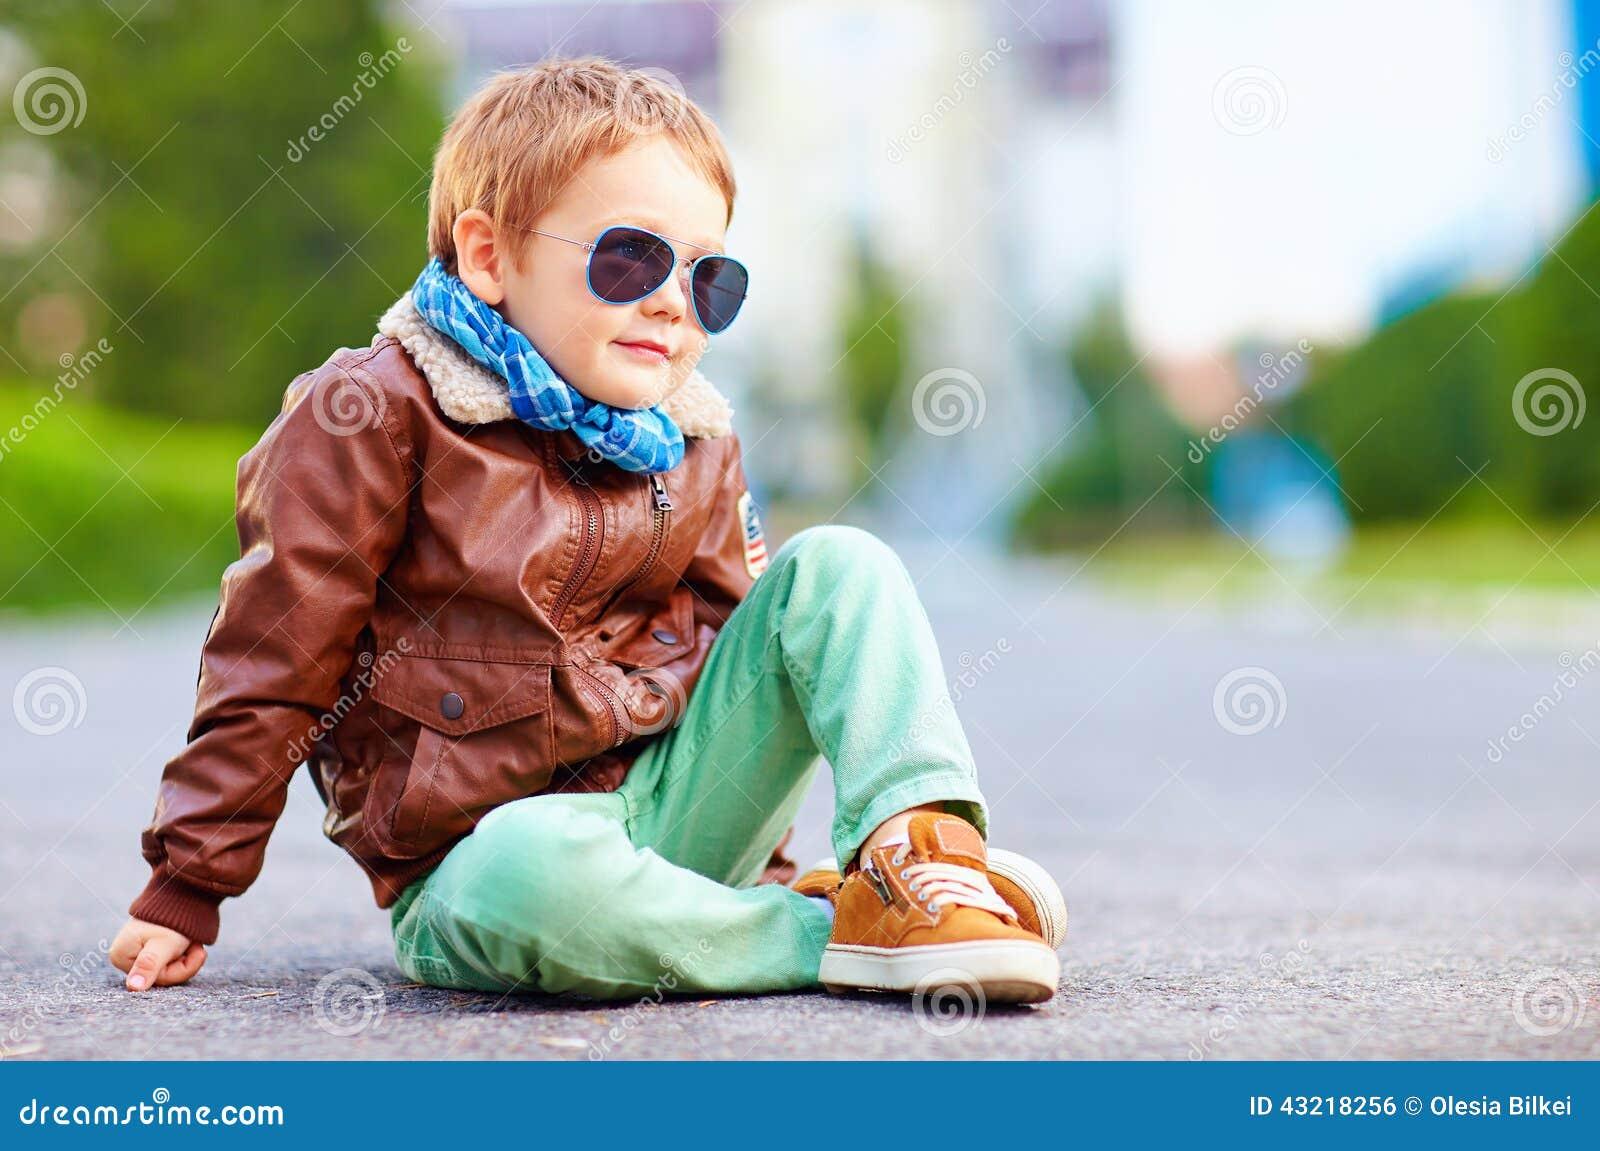 Stylish Boy In Leather Jacket Sitting On The Road Stock Photo